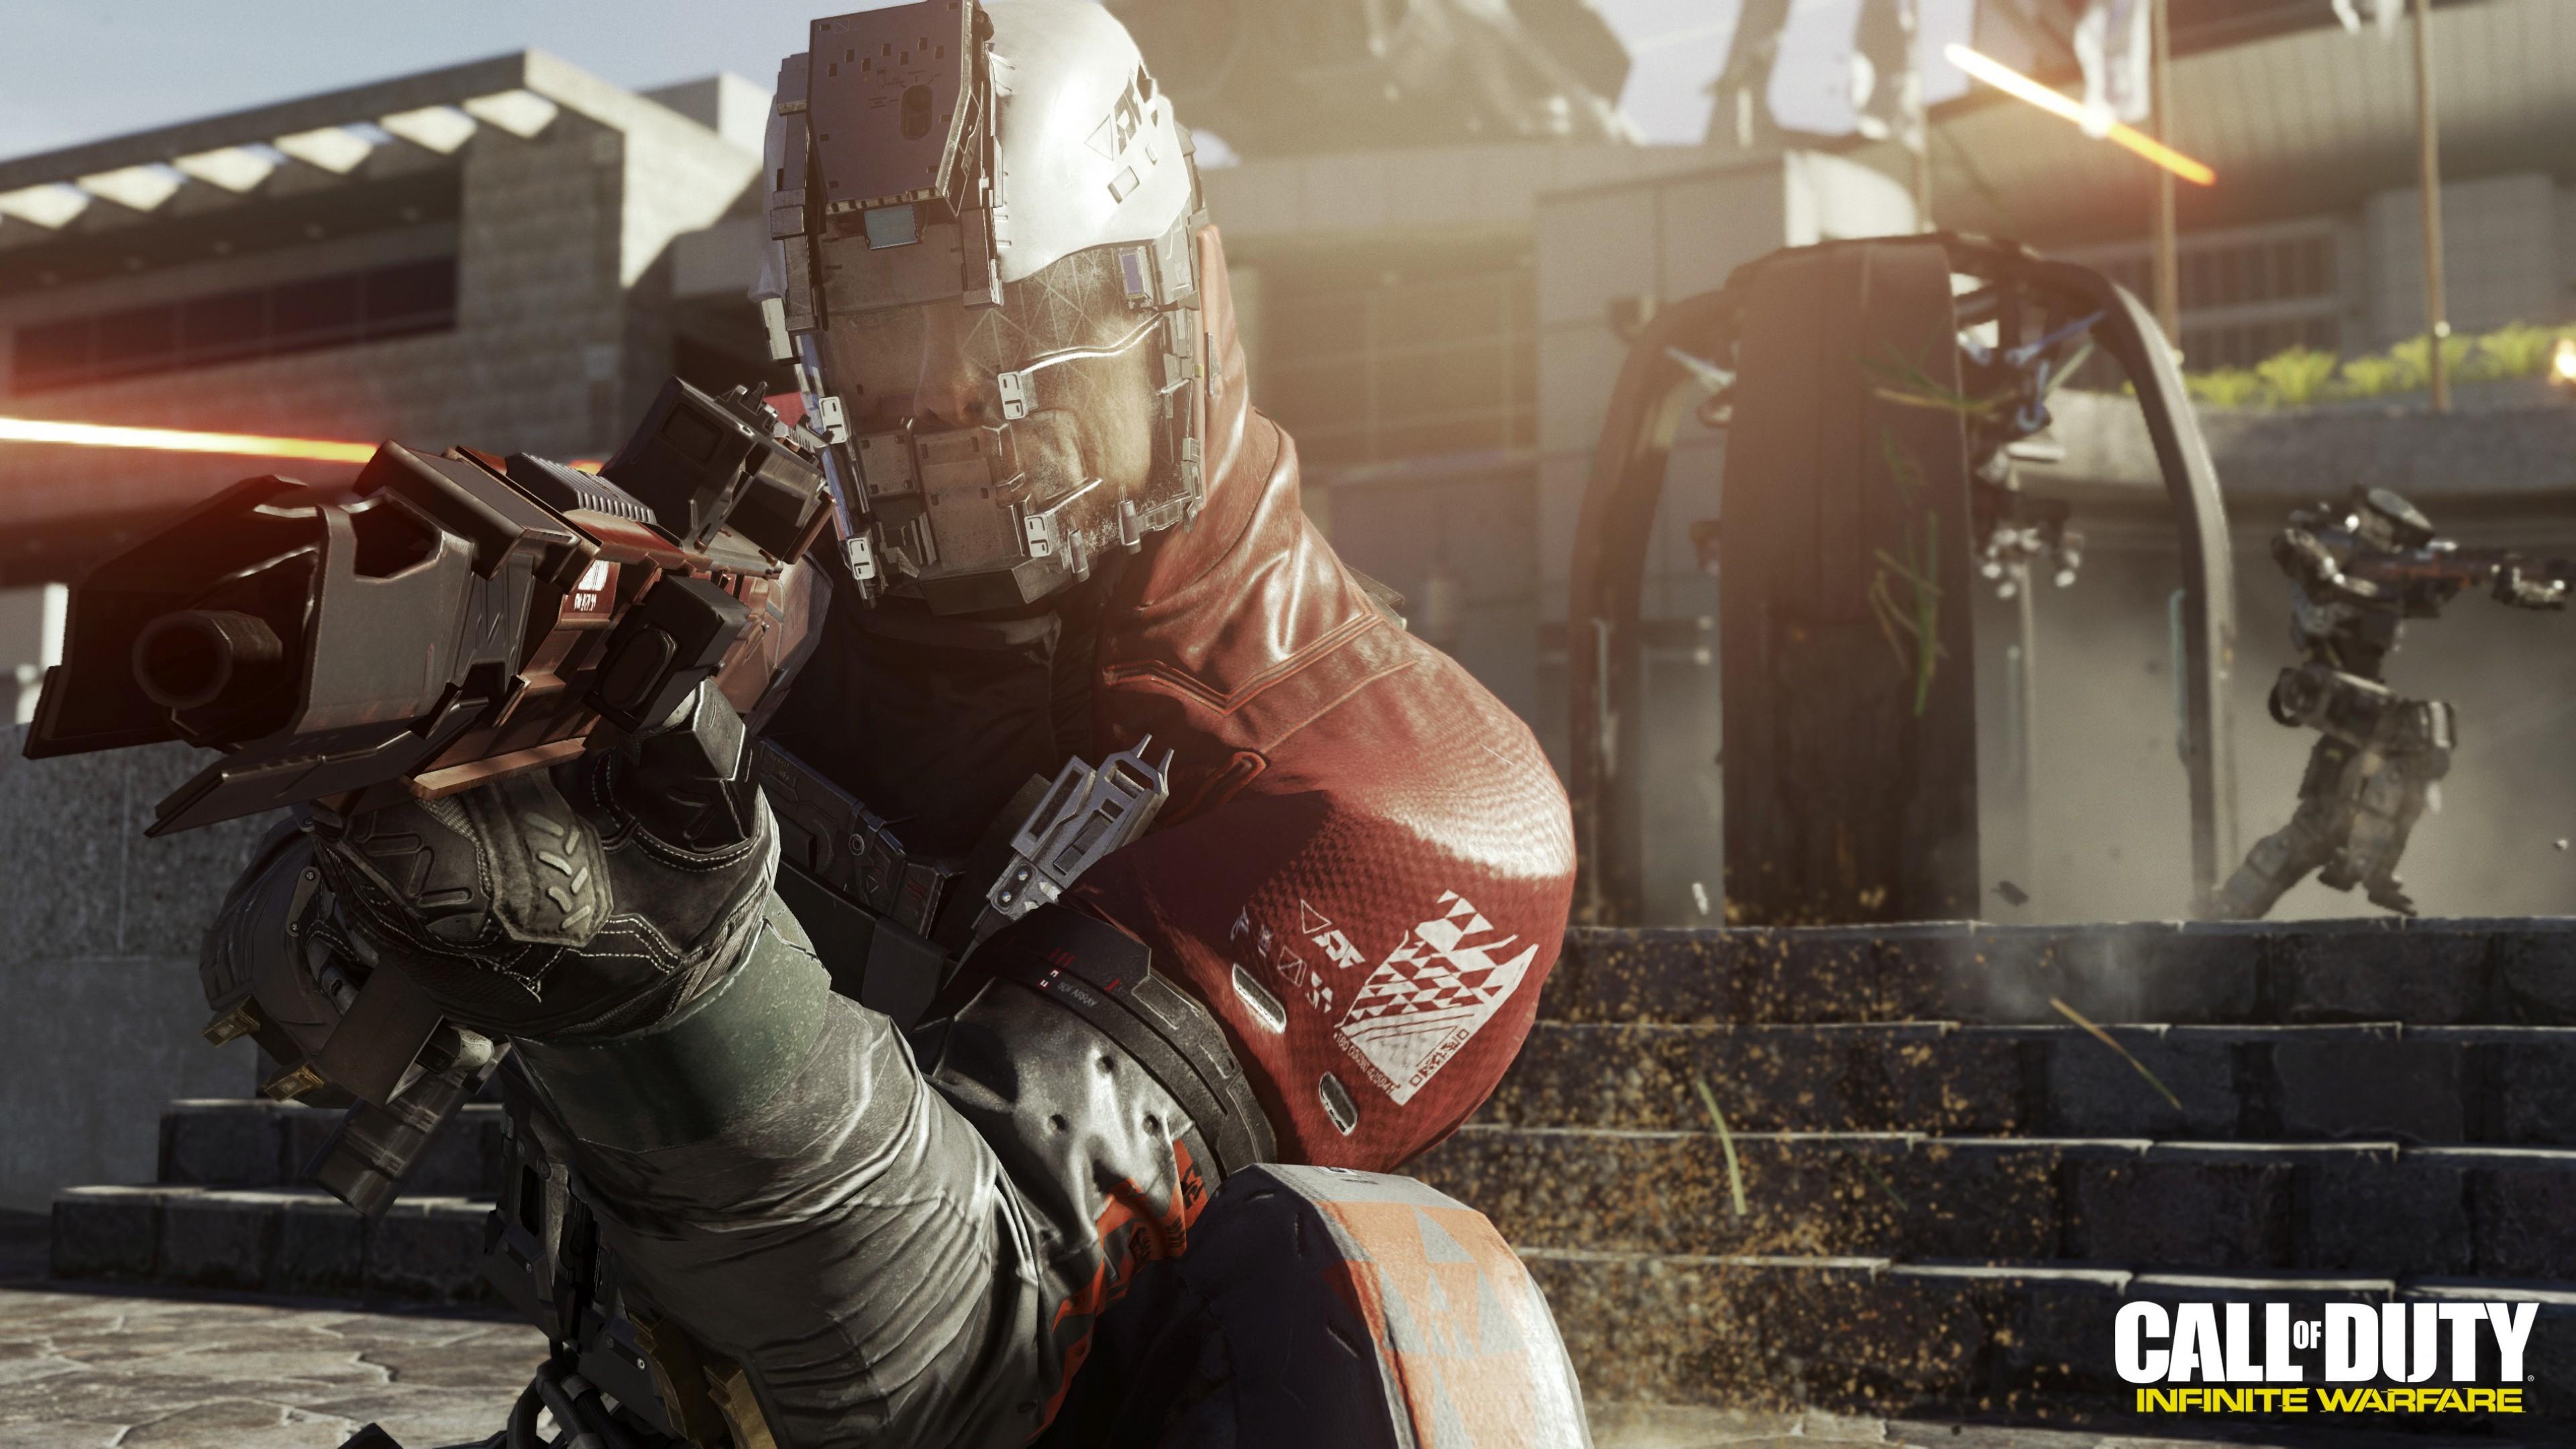 Wallpaper Call of Duty: Infinite Warfare, shooter, PC, PS 4